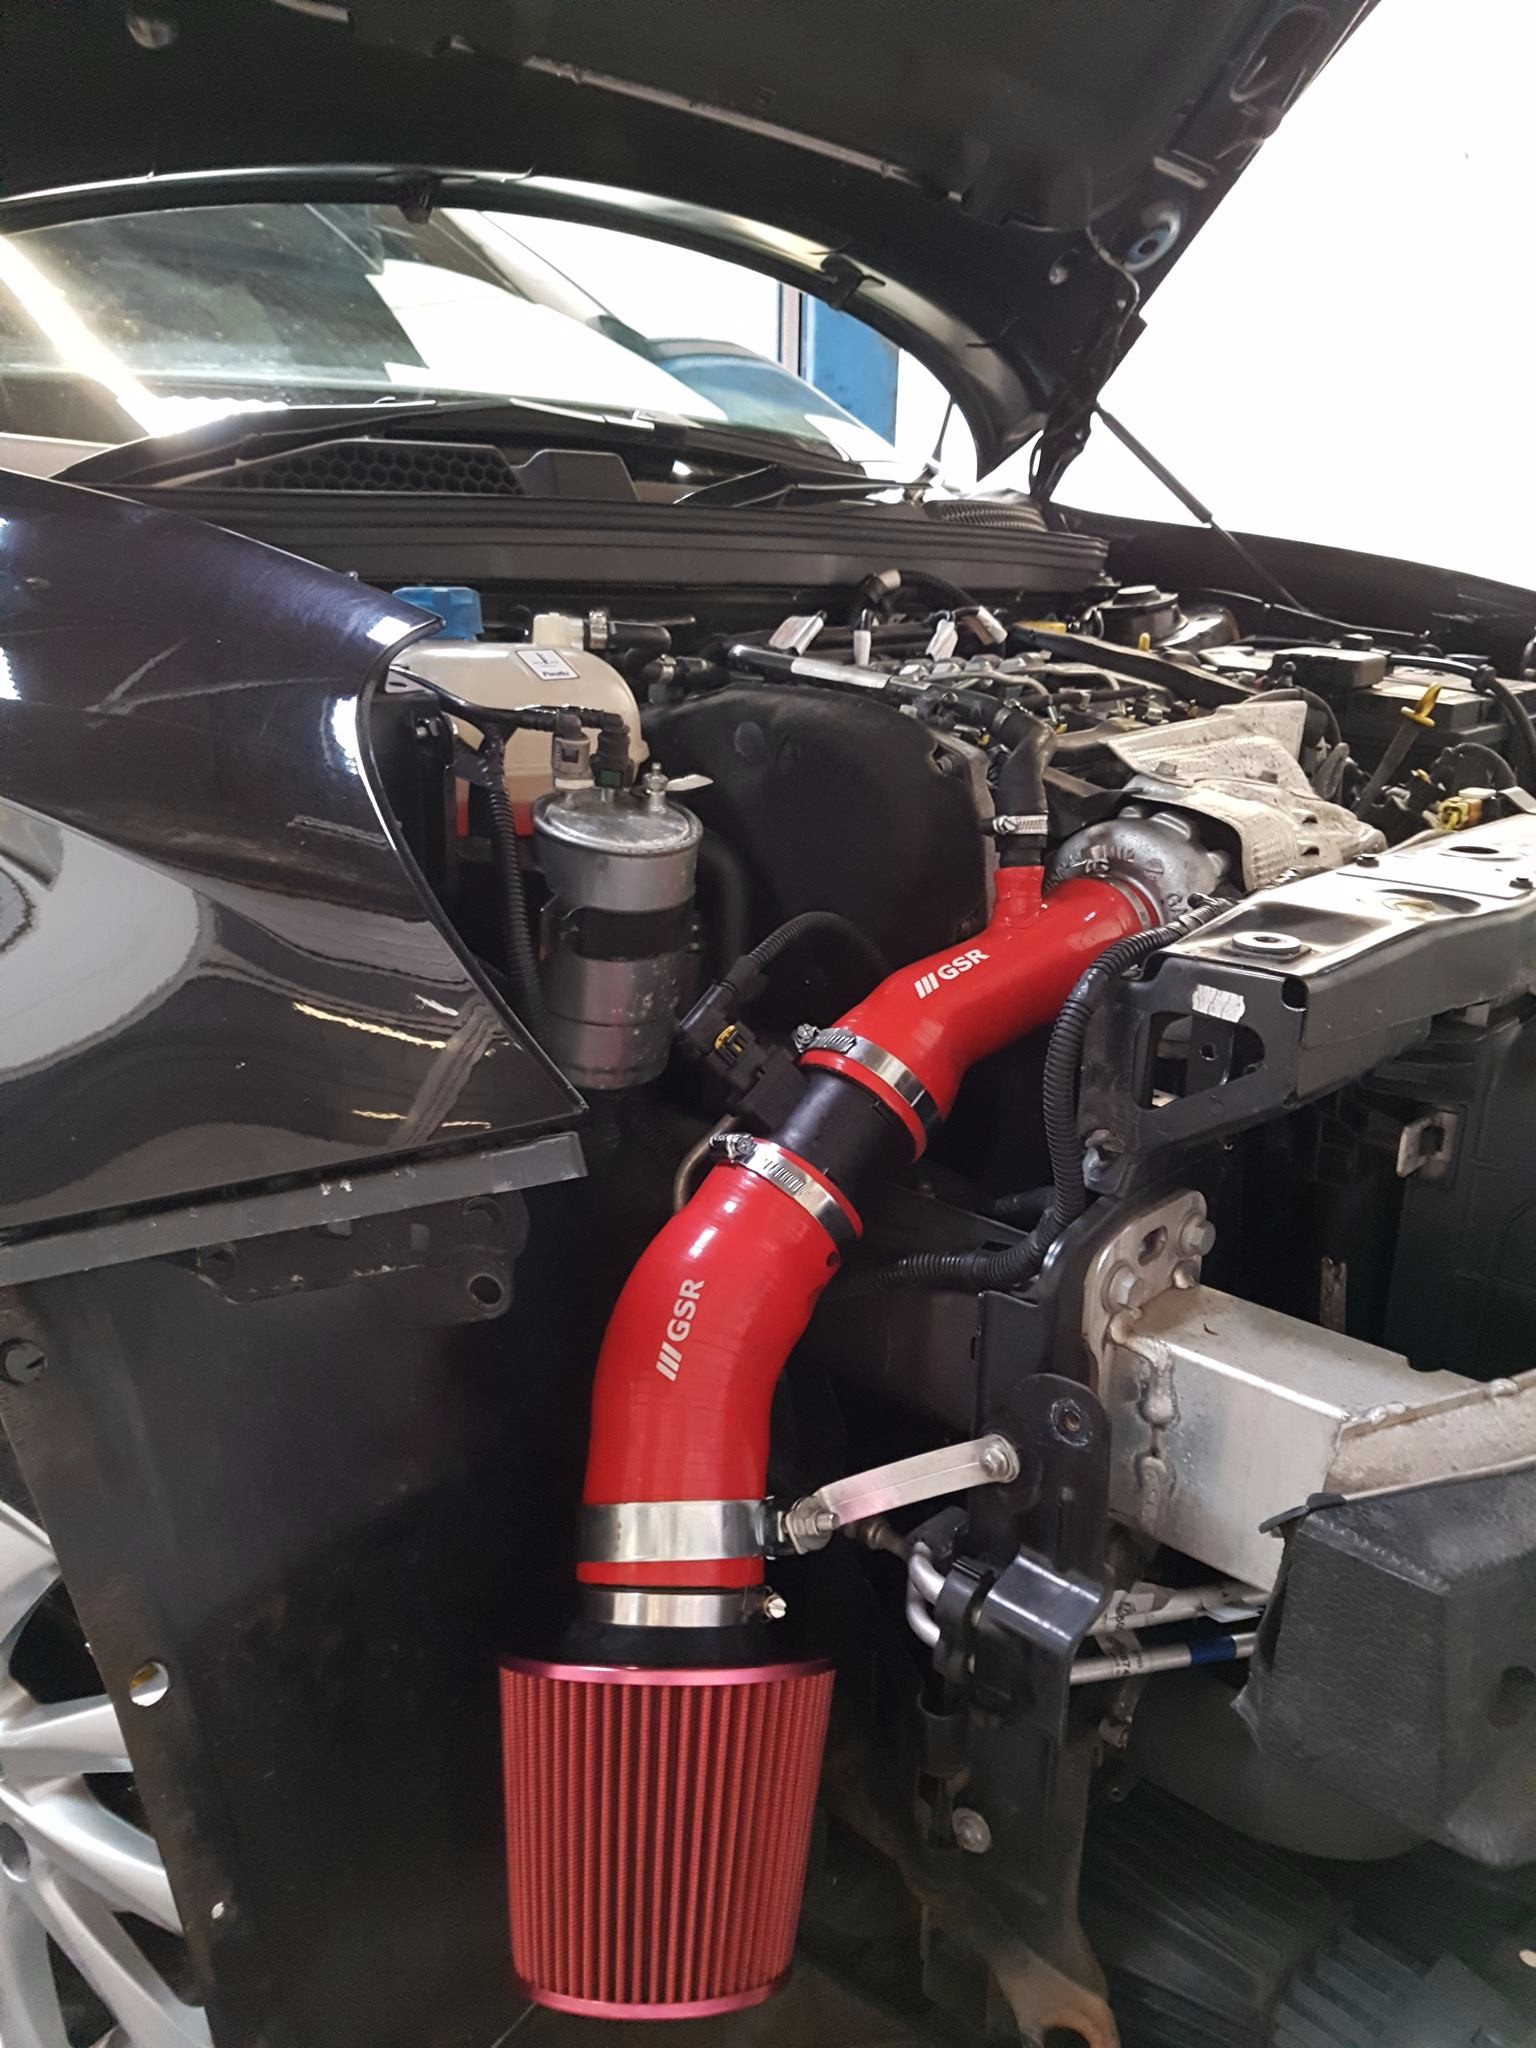 Alfa Romeo Giulia >> Giulietta 2.0 JTDm induction kit cold air intake